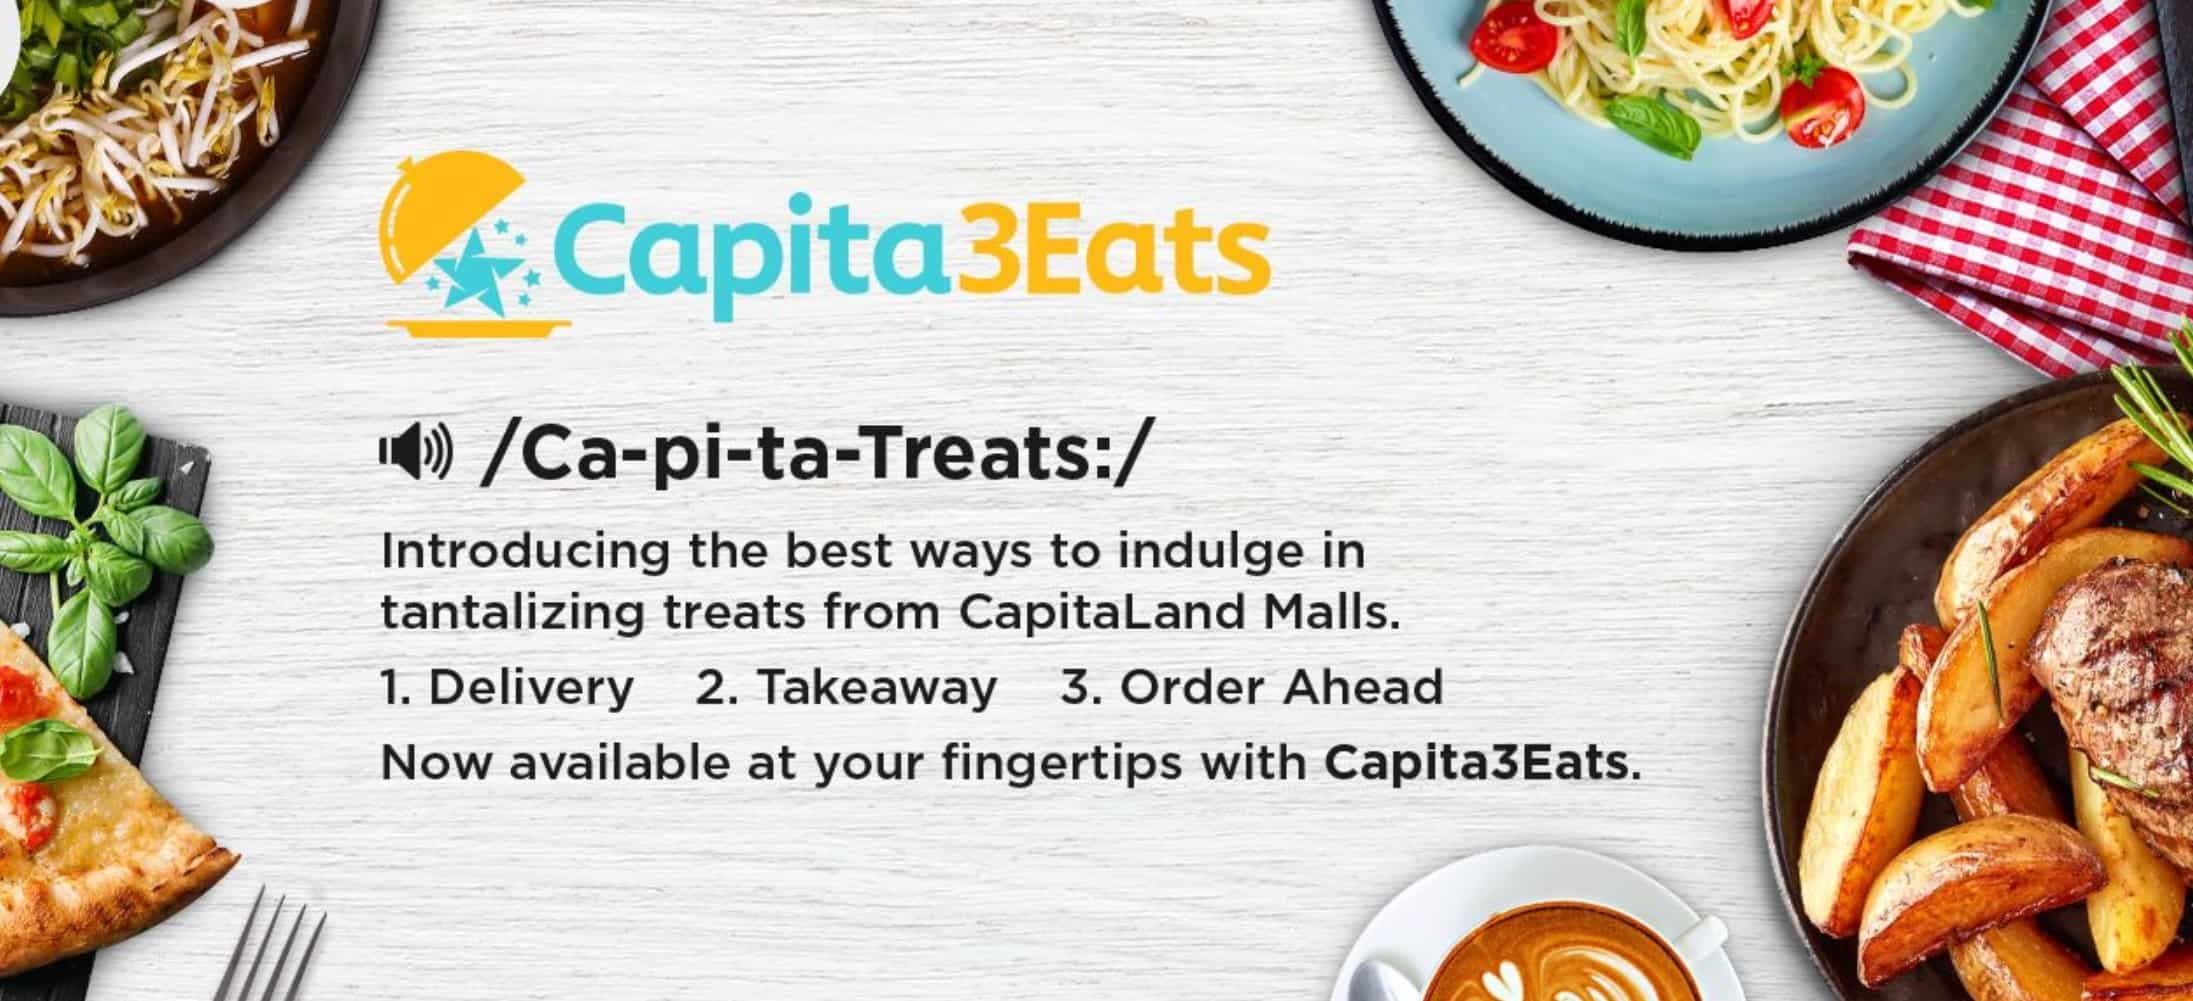 CapitaLand food delivery Capita3Eats